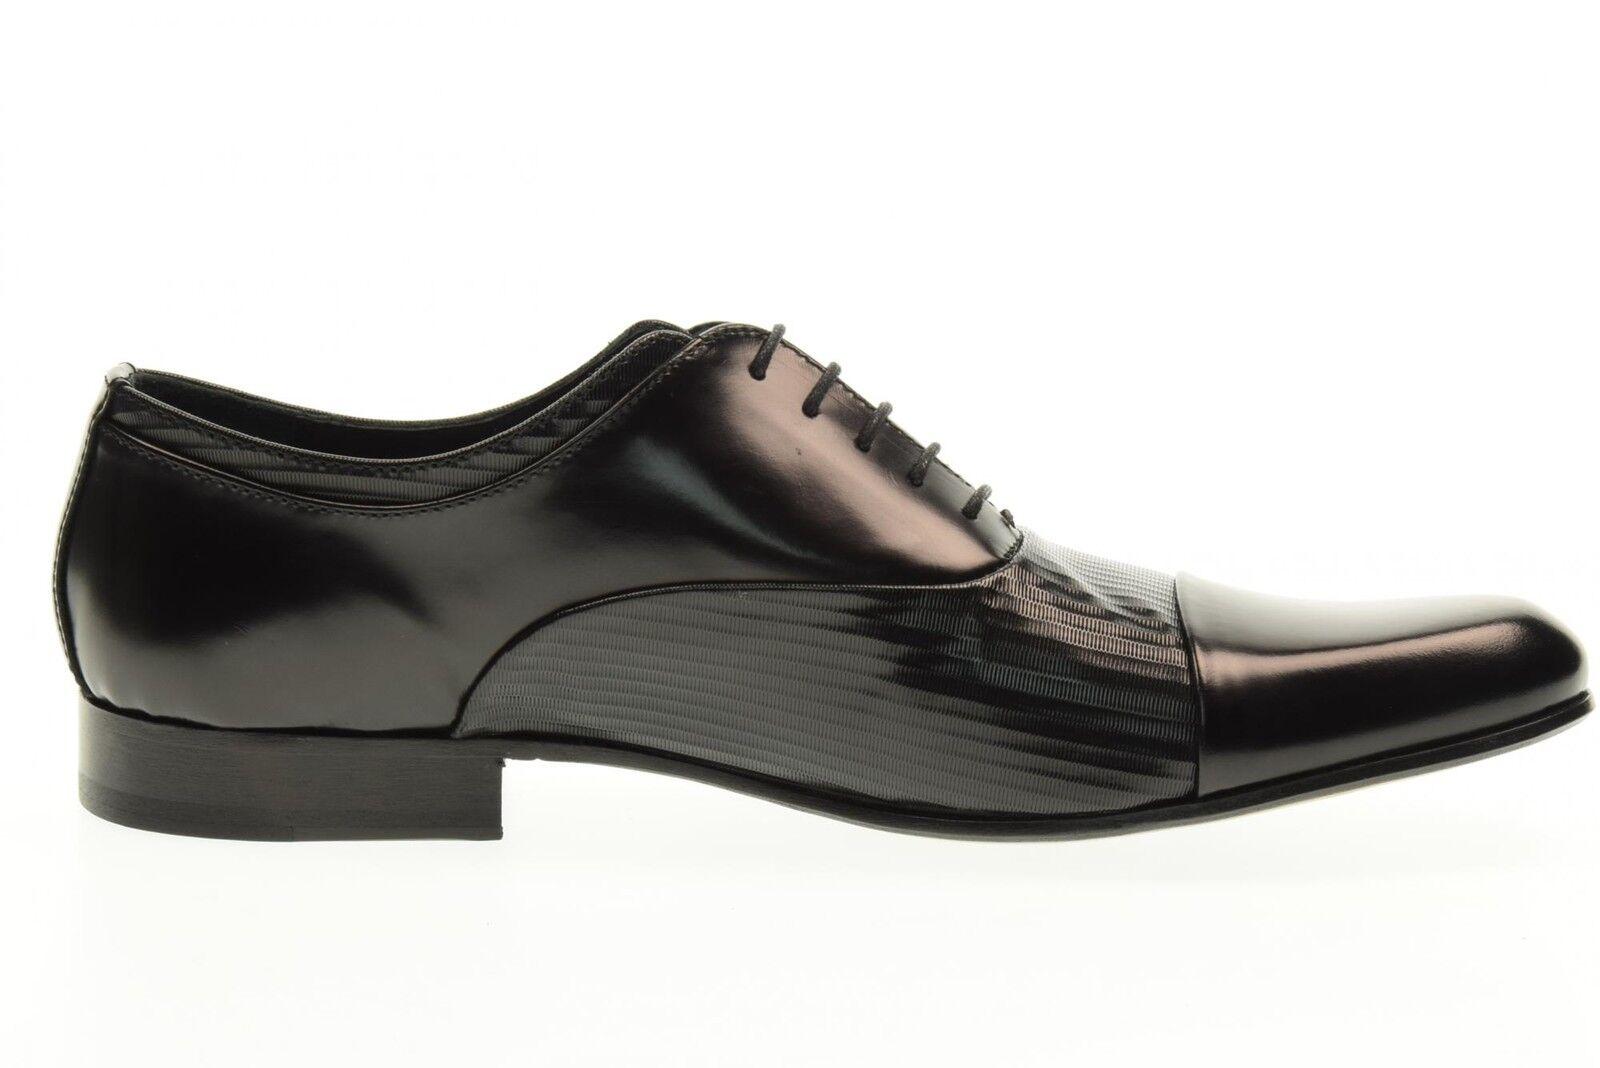 Eveet Eveet Eveet scarpe uomo stringate 15910 P REX-RIGA P17 7a9ab0